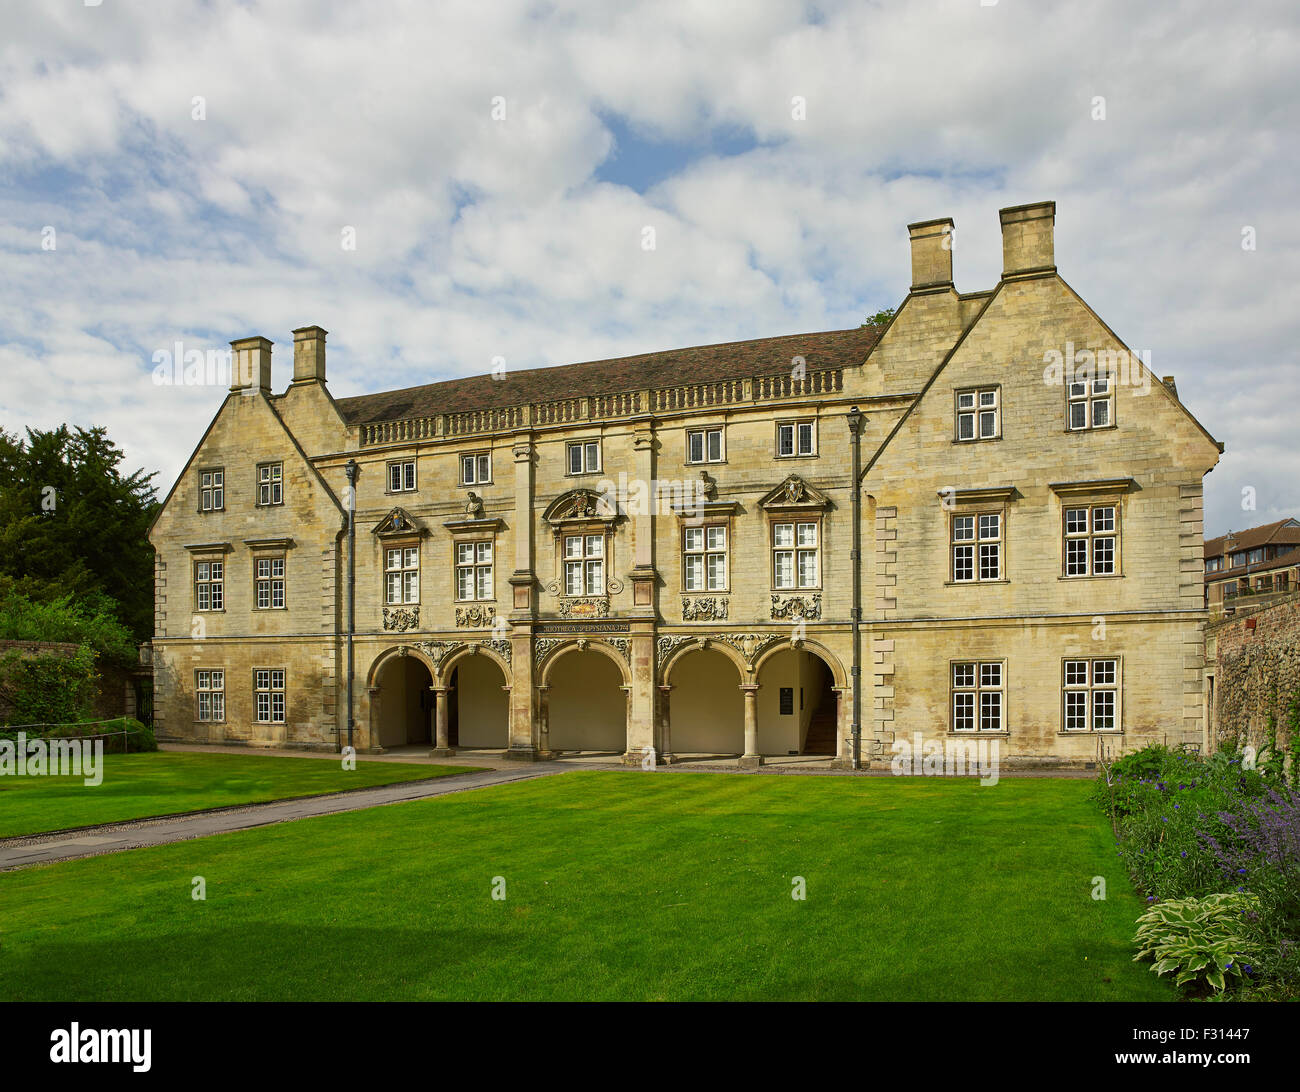 Cambridge, Magdalene College, Pepys Building - Stock Image